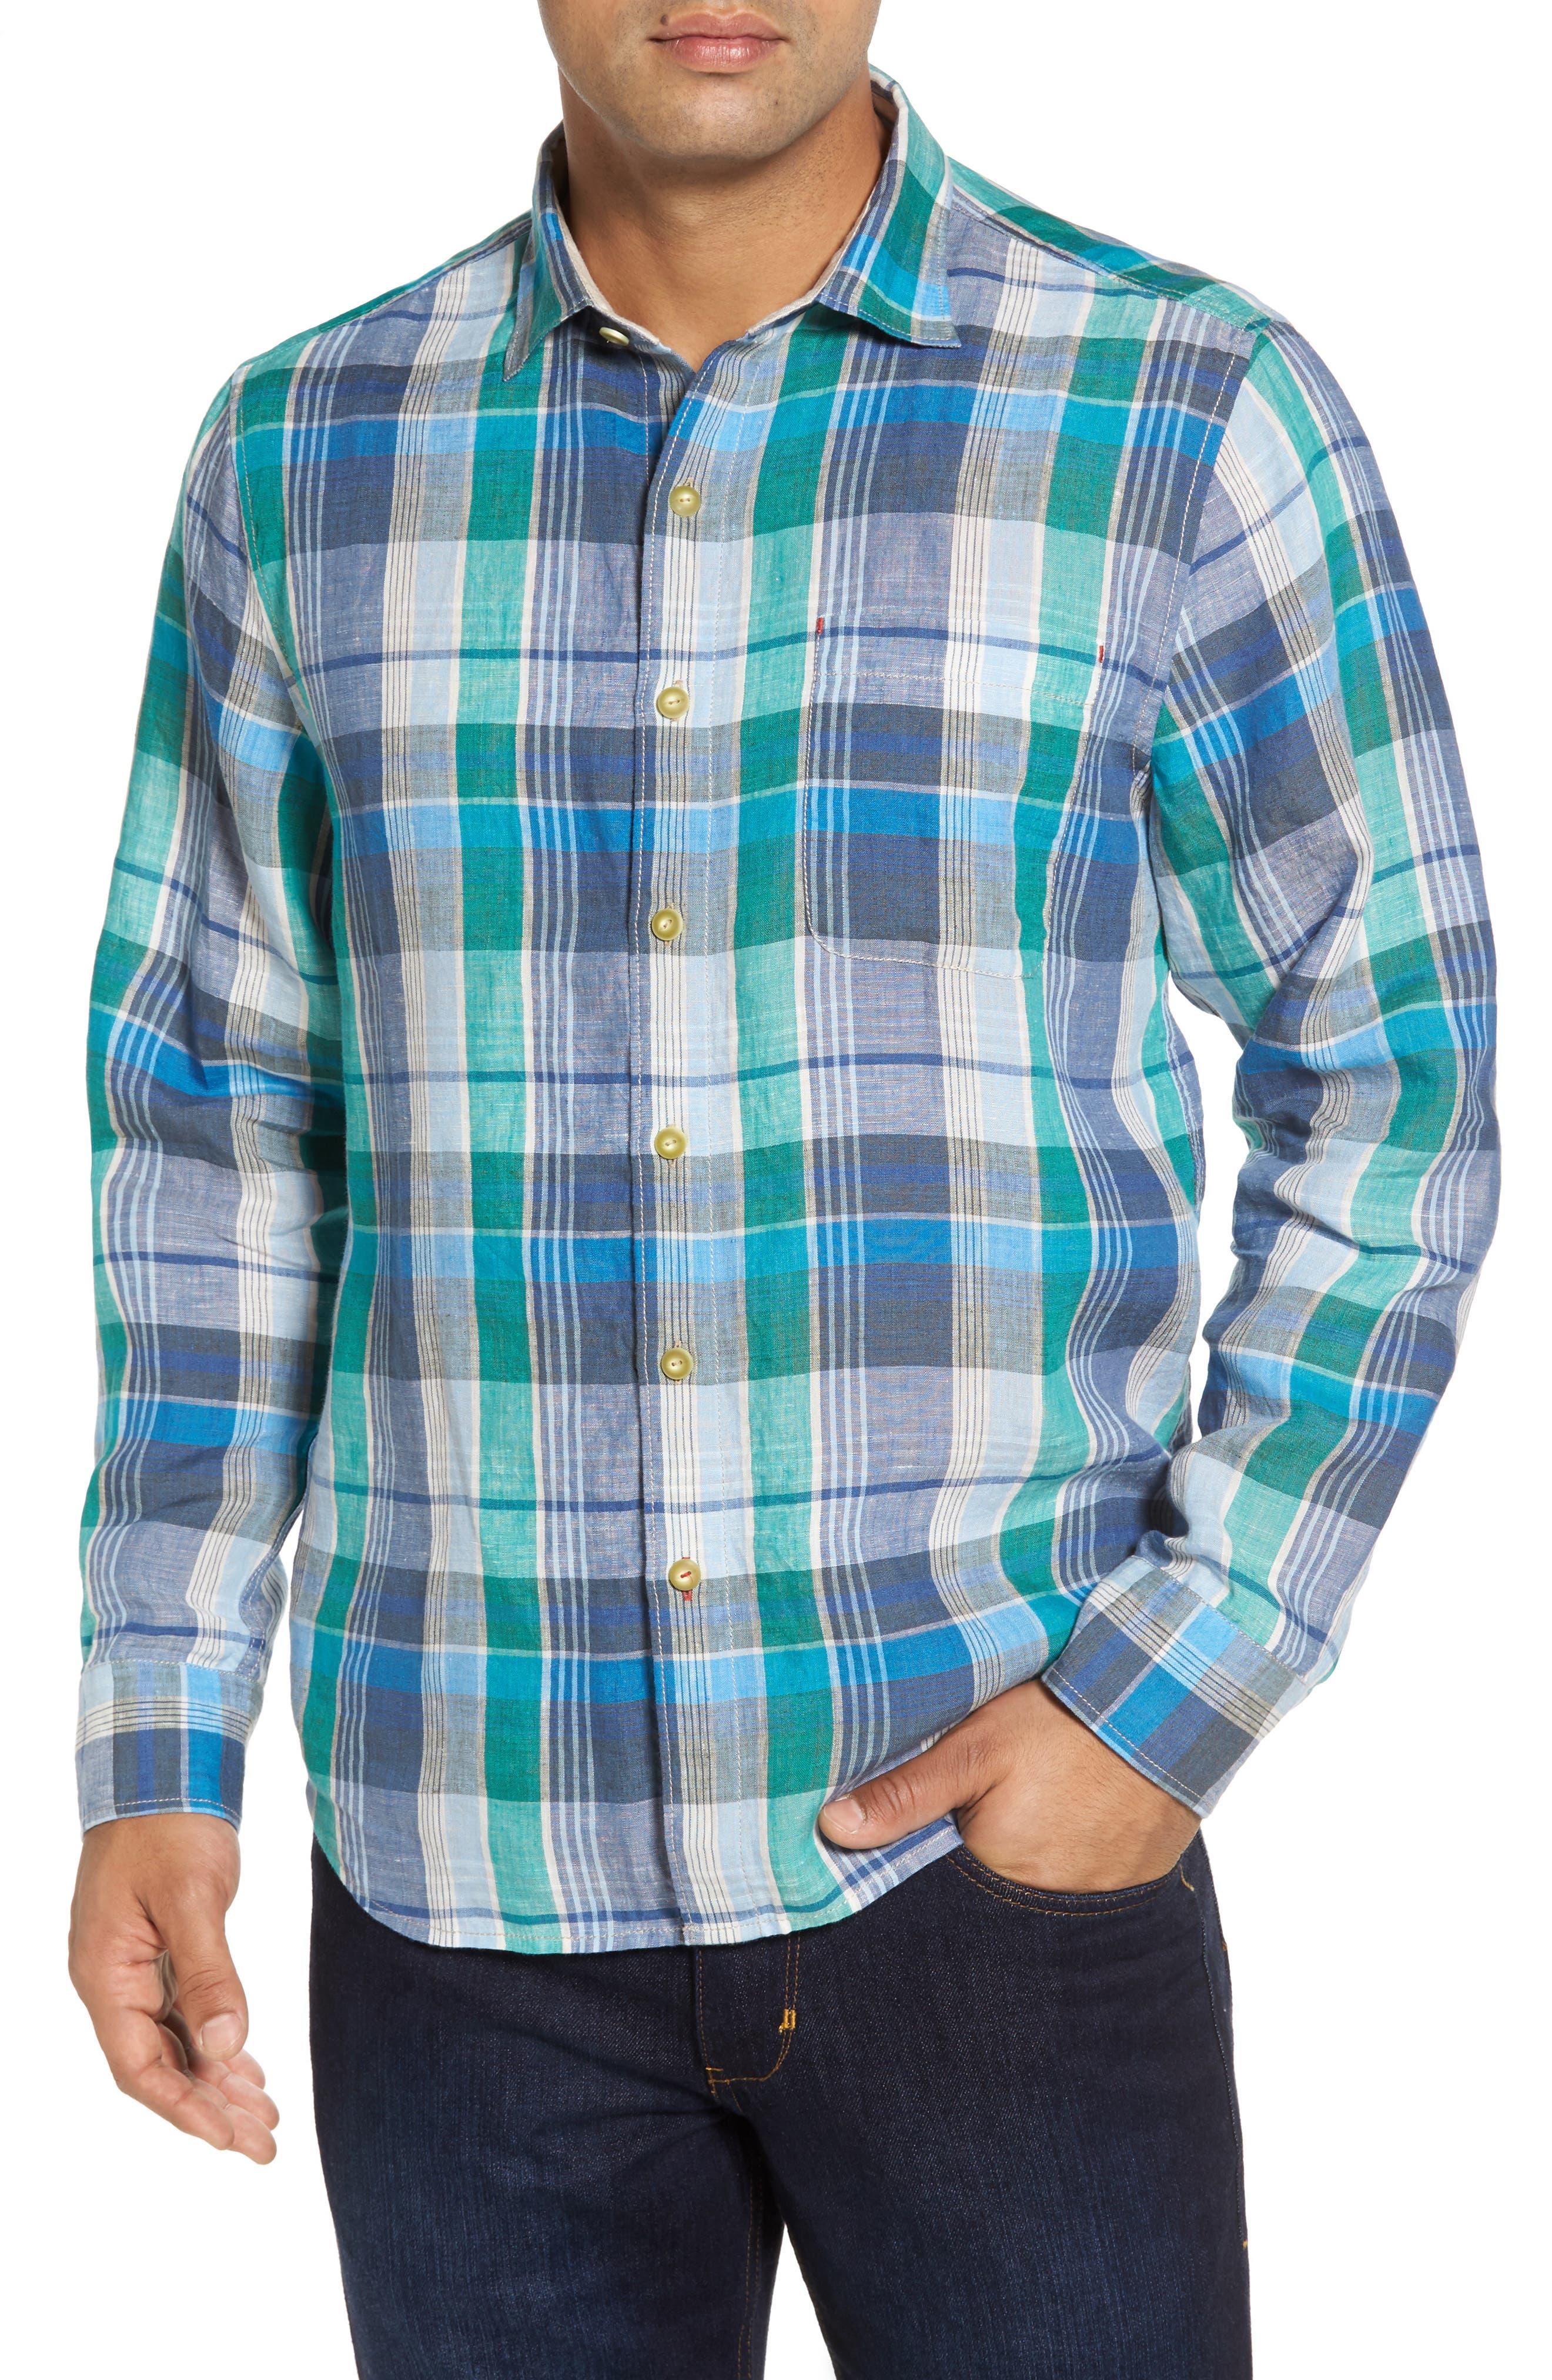 TOMMY BAHAMA Vero Beach Madras Plaid Linen Sport Shirt, Main, color, 300